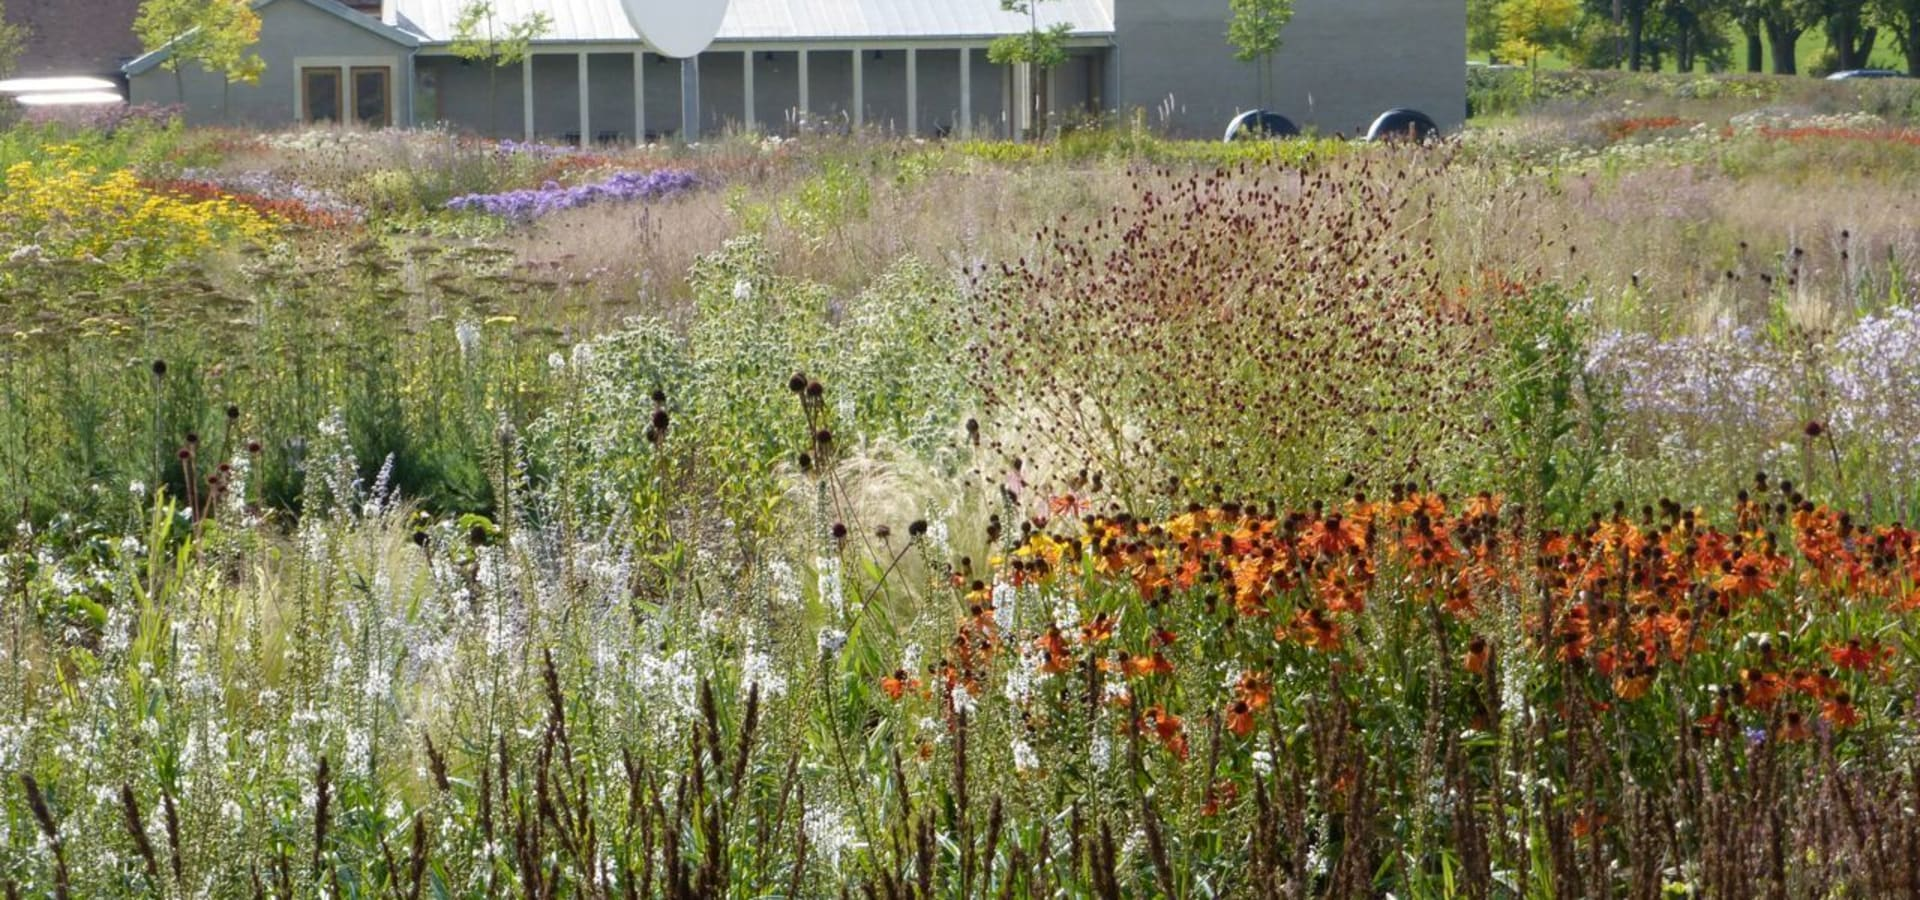 Petherick, Urquhart & Hunt Landscape Consultancy